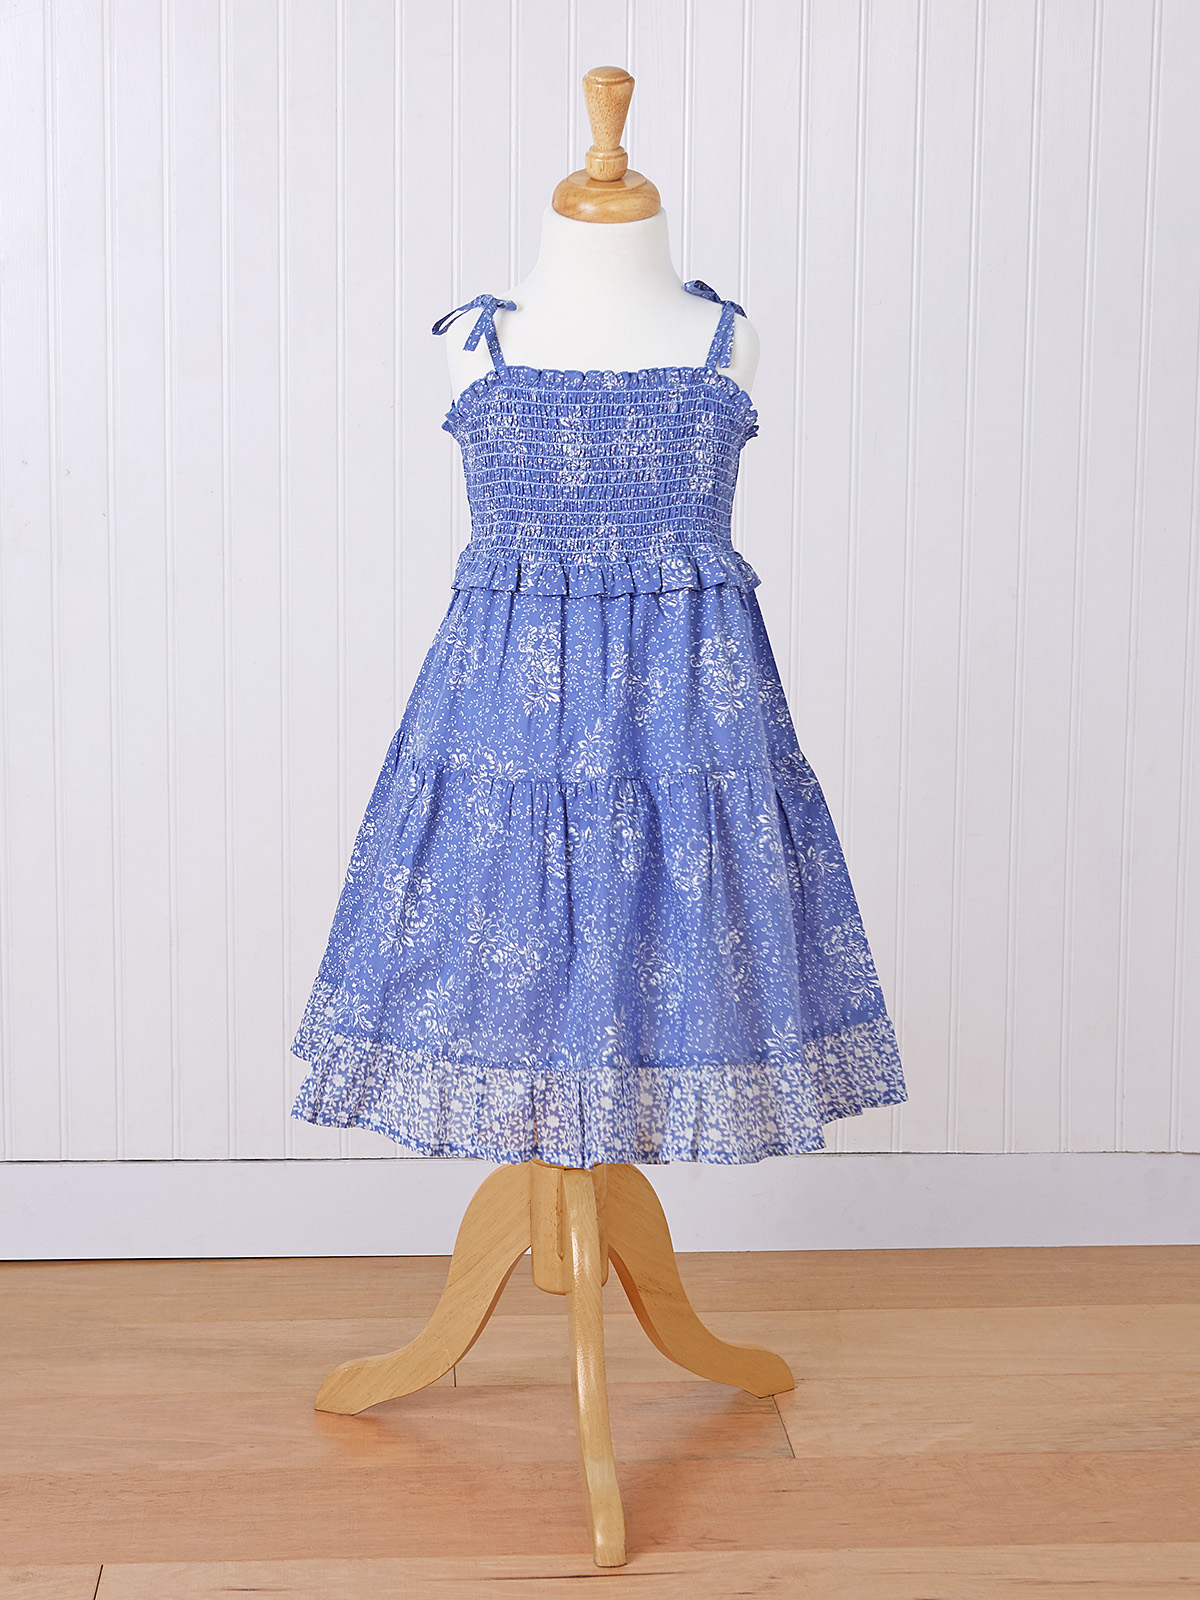 Poetry Girls Dress